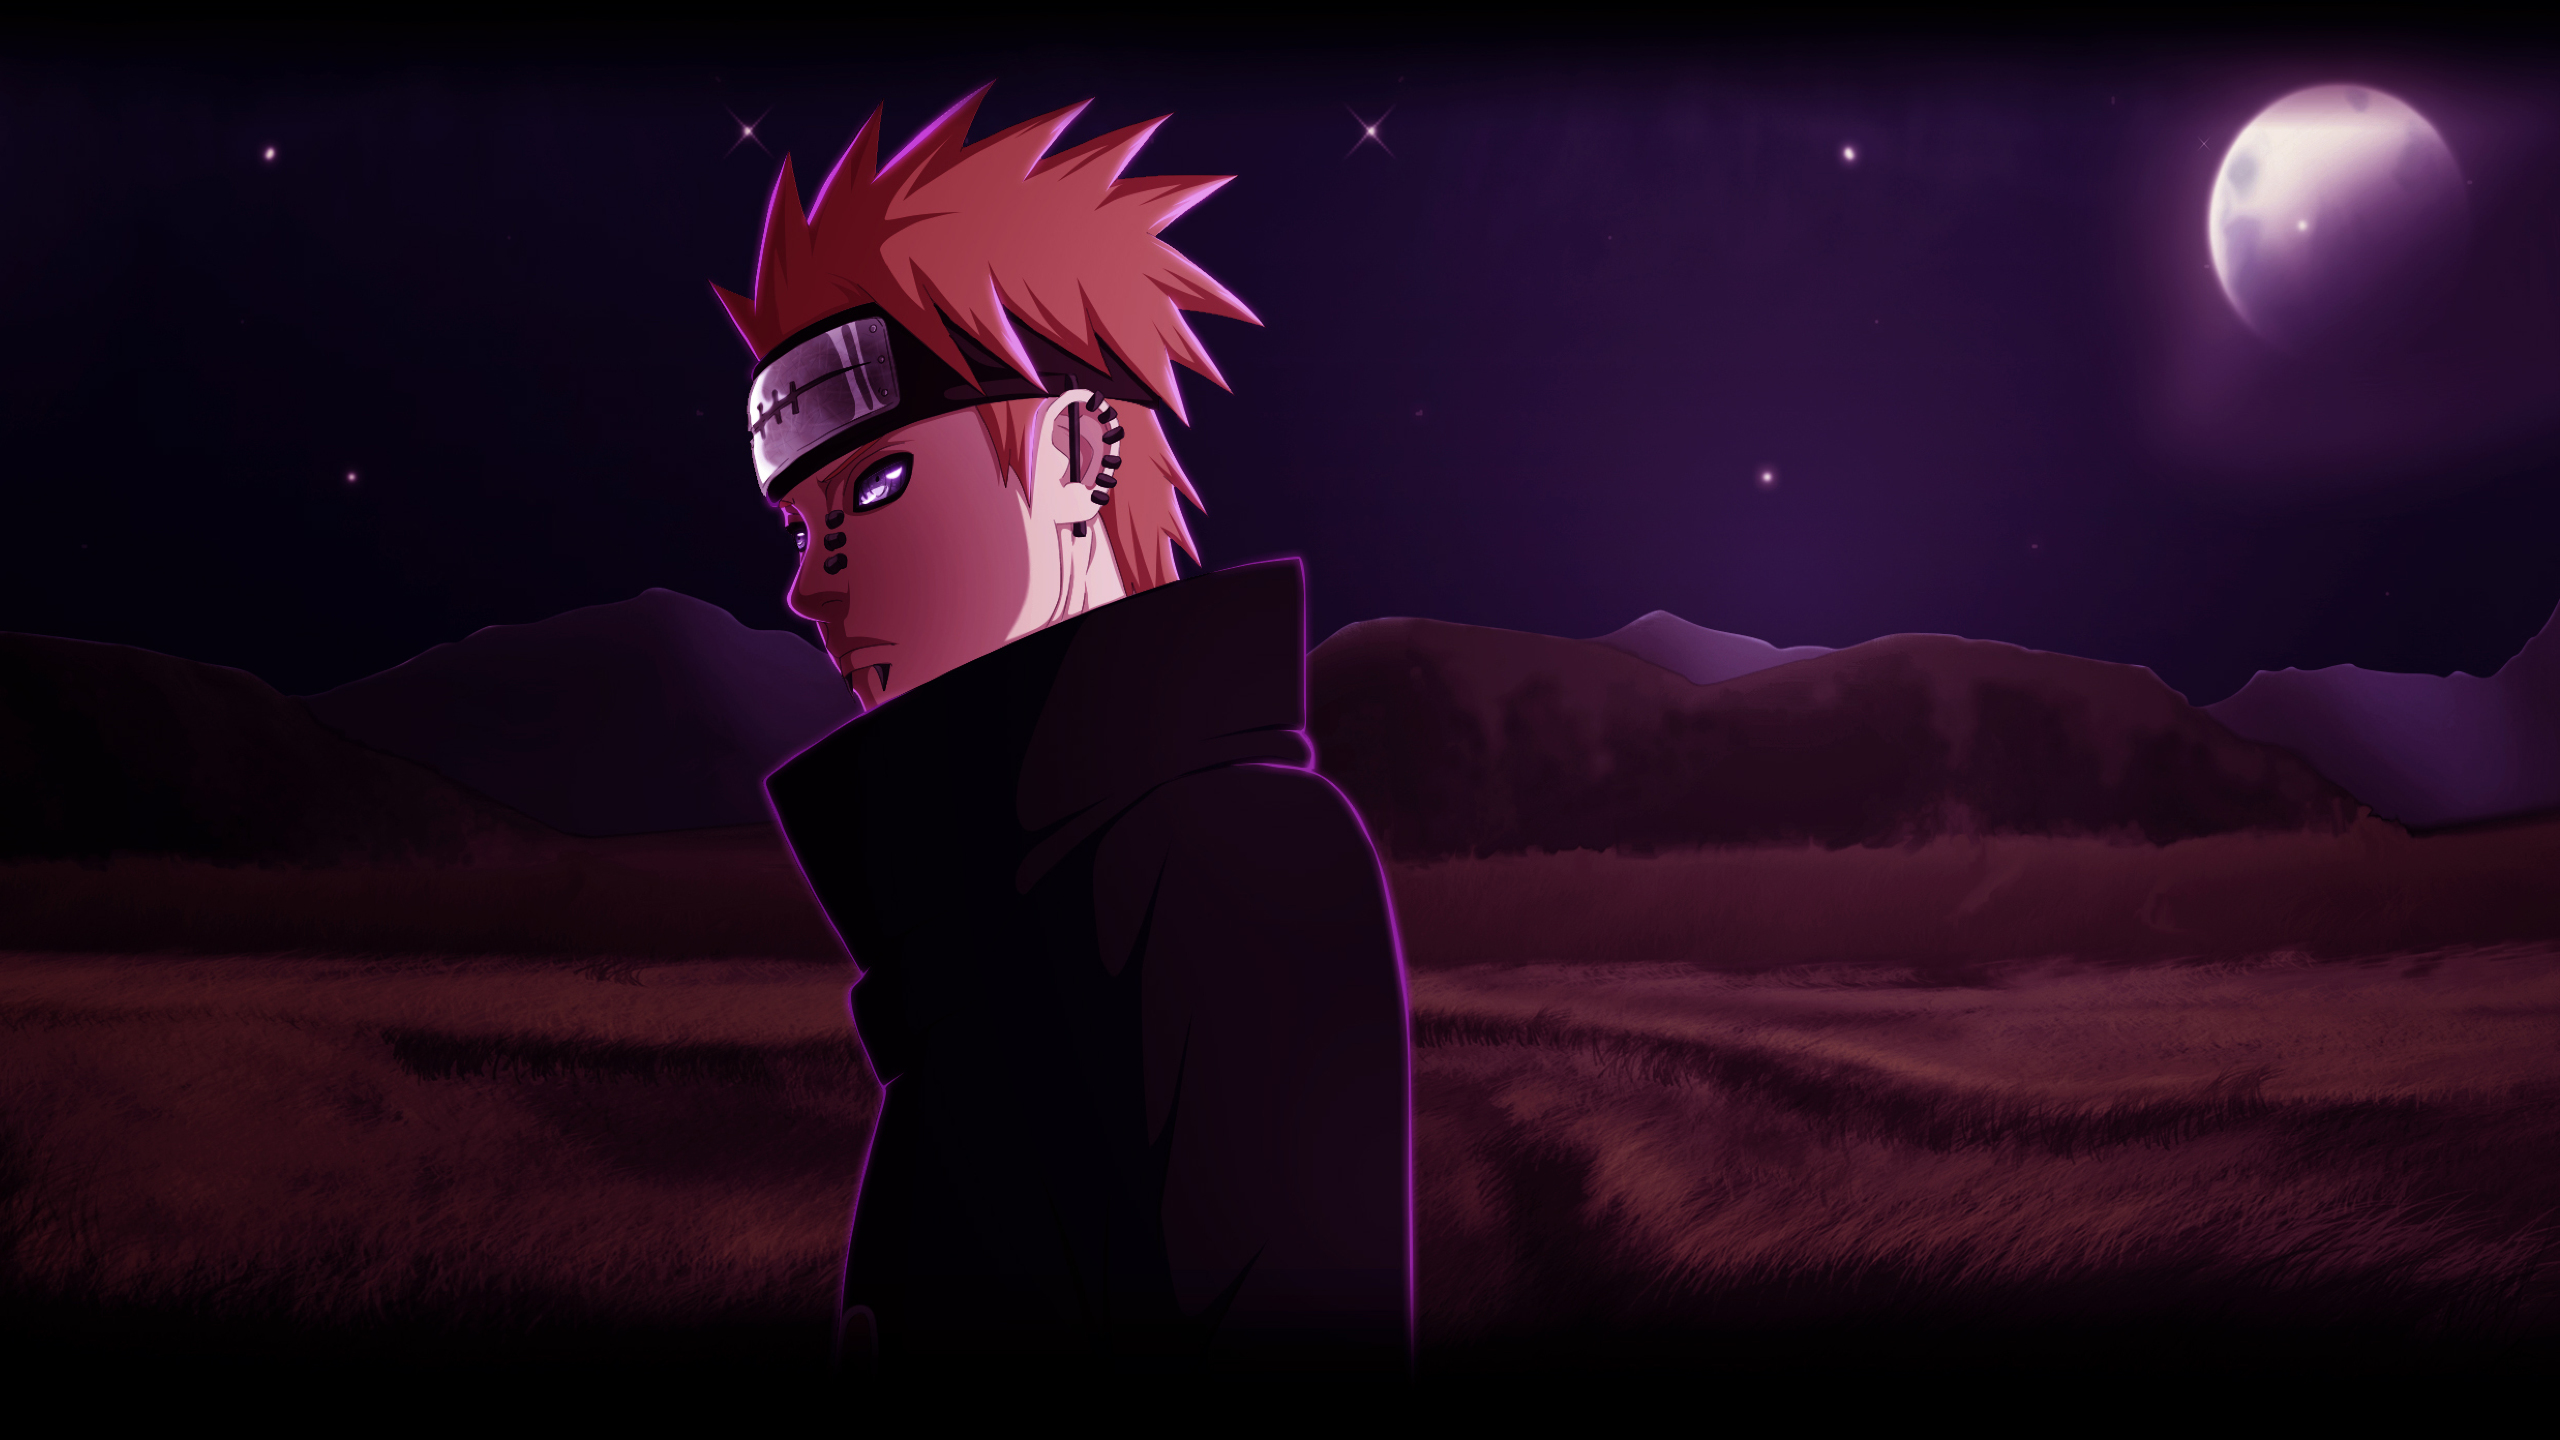 Pain Naruto Wallpaper 4k